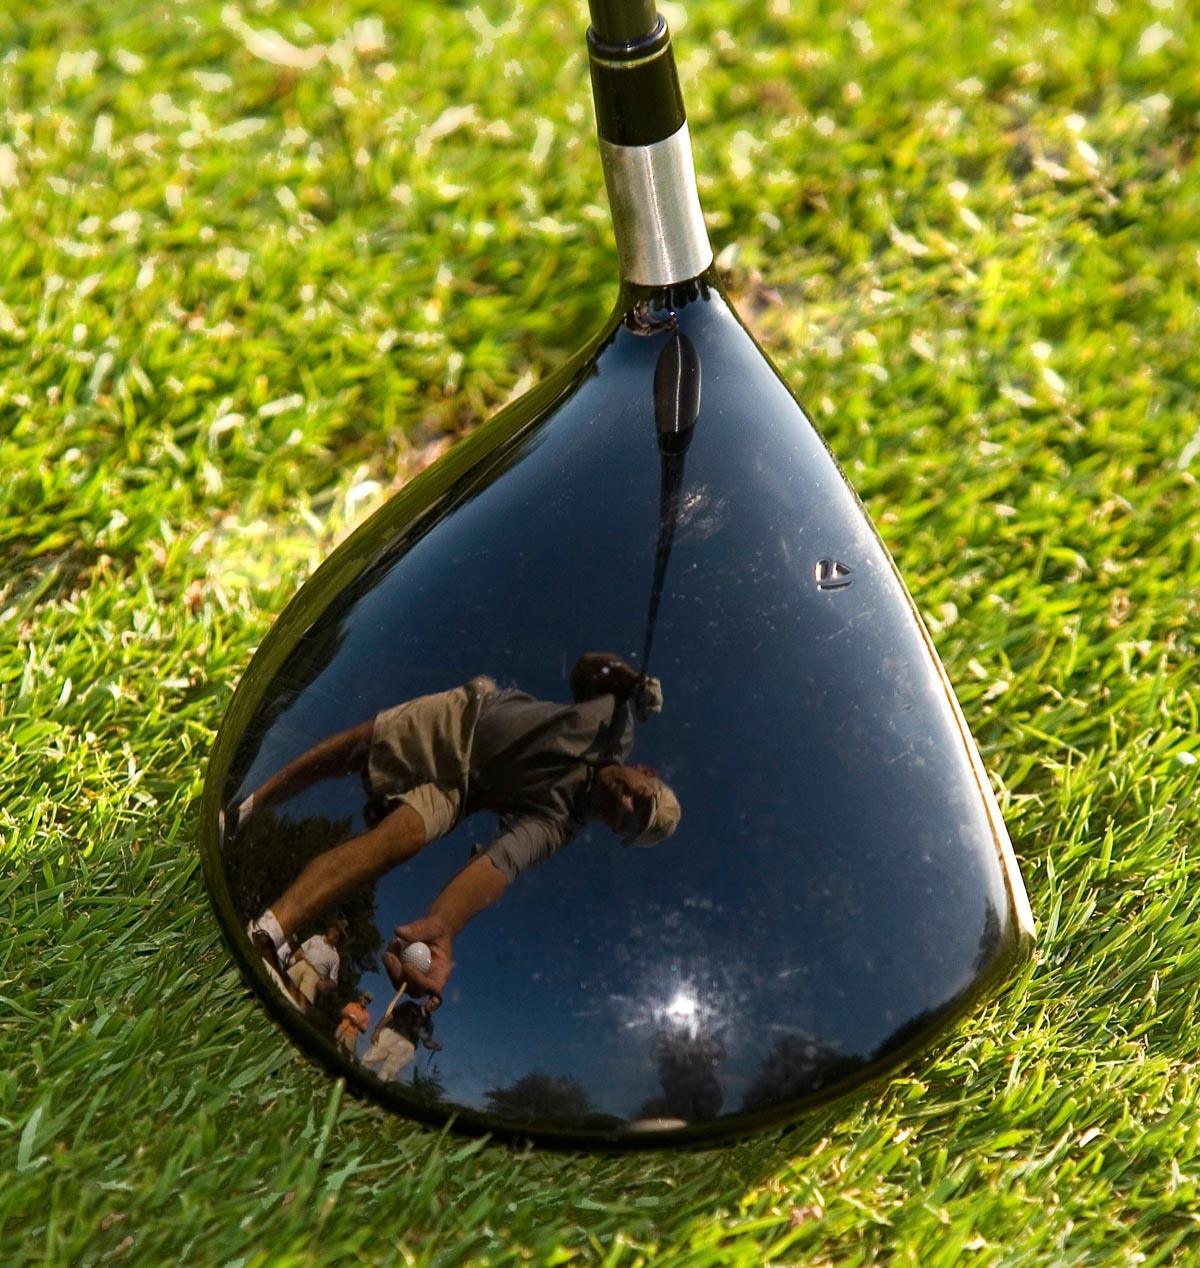 Golf_A71cr2